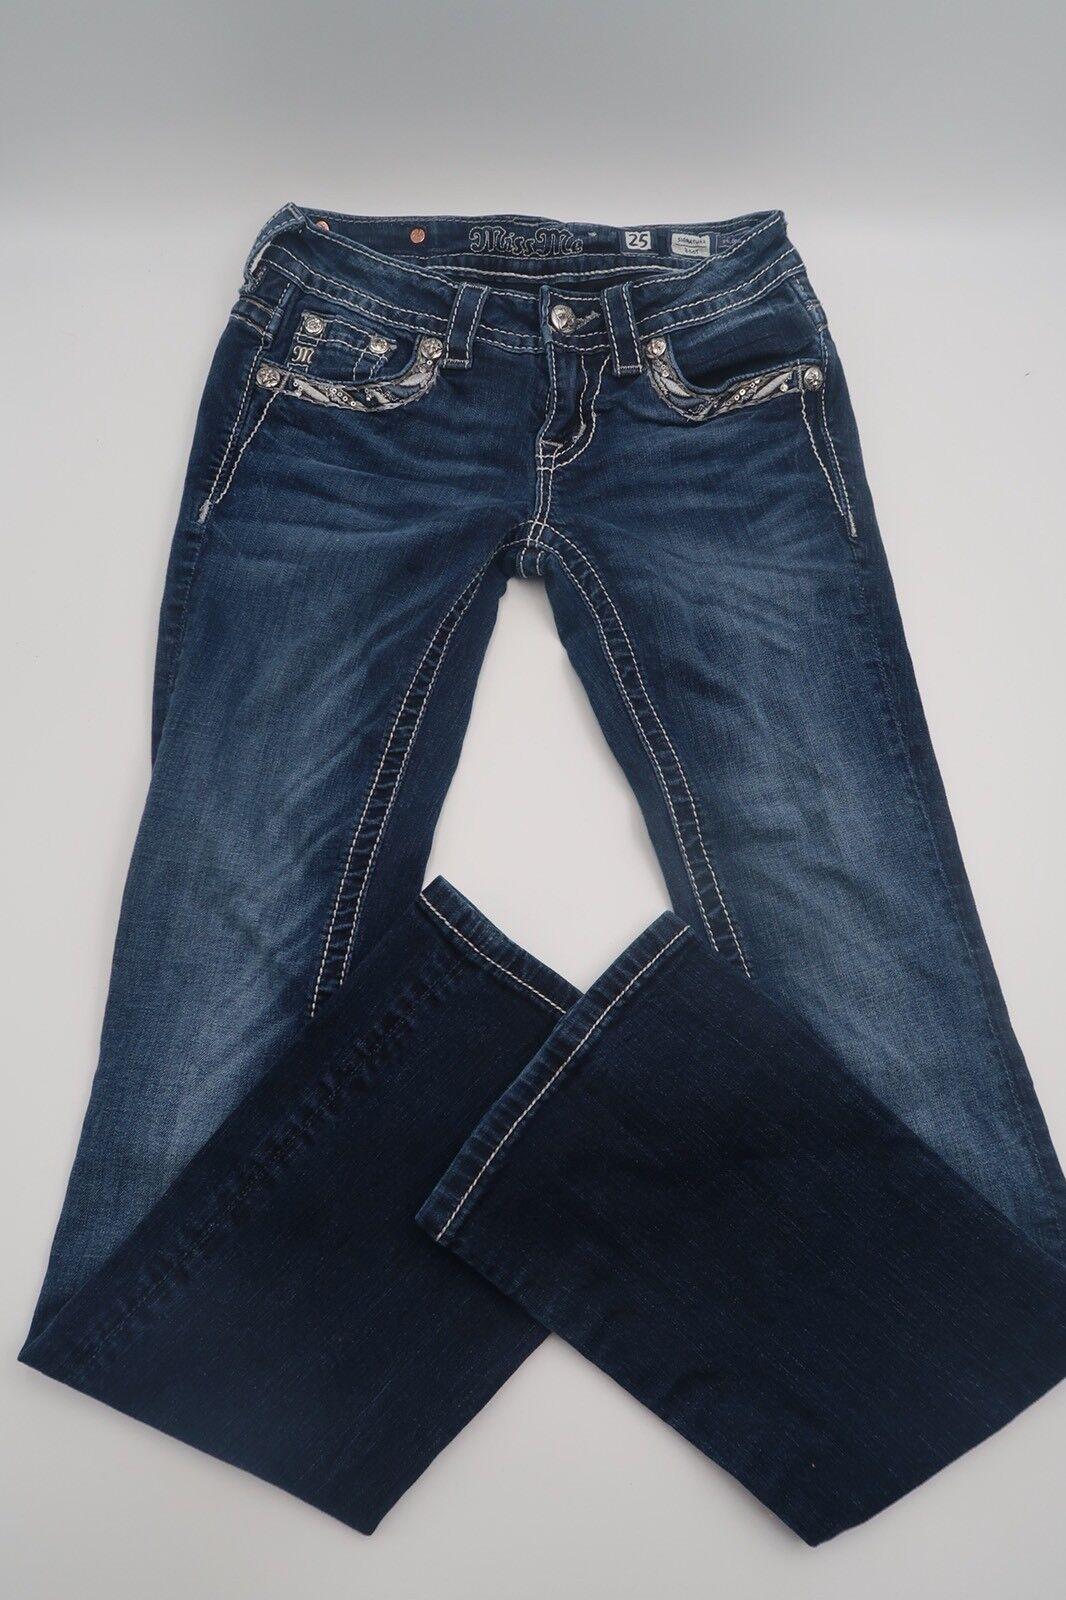 Miss Me 25 Signature Boot JE8202BR Rhinestones Sequins bluee Denim Jeans